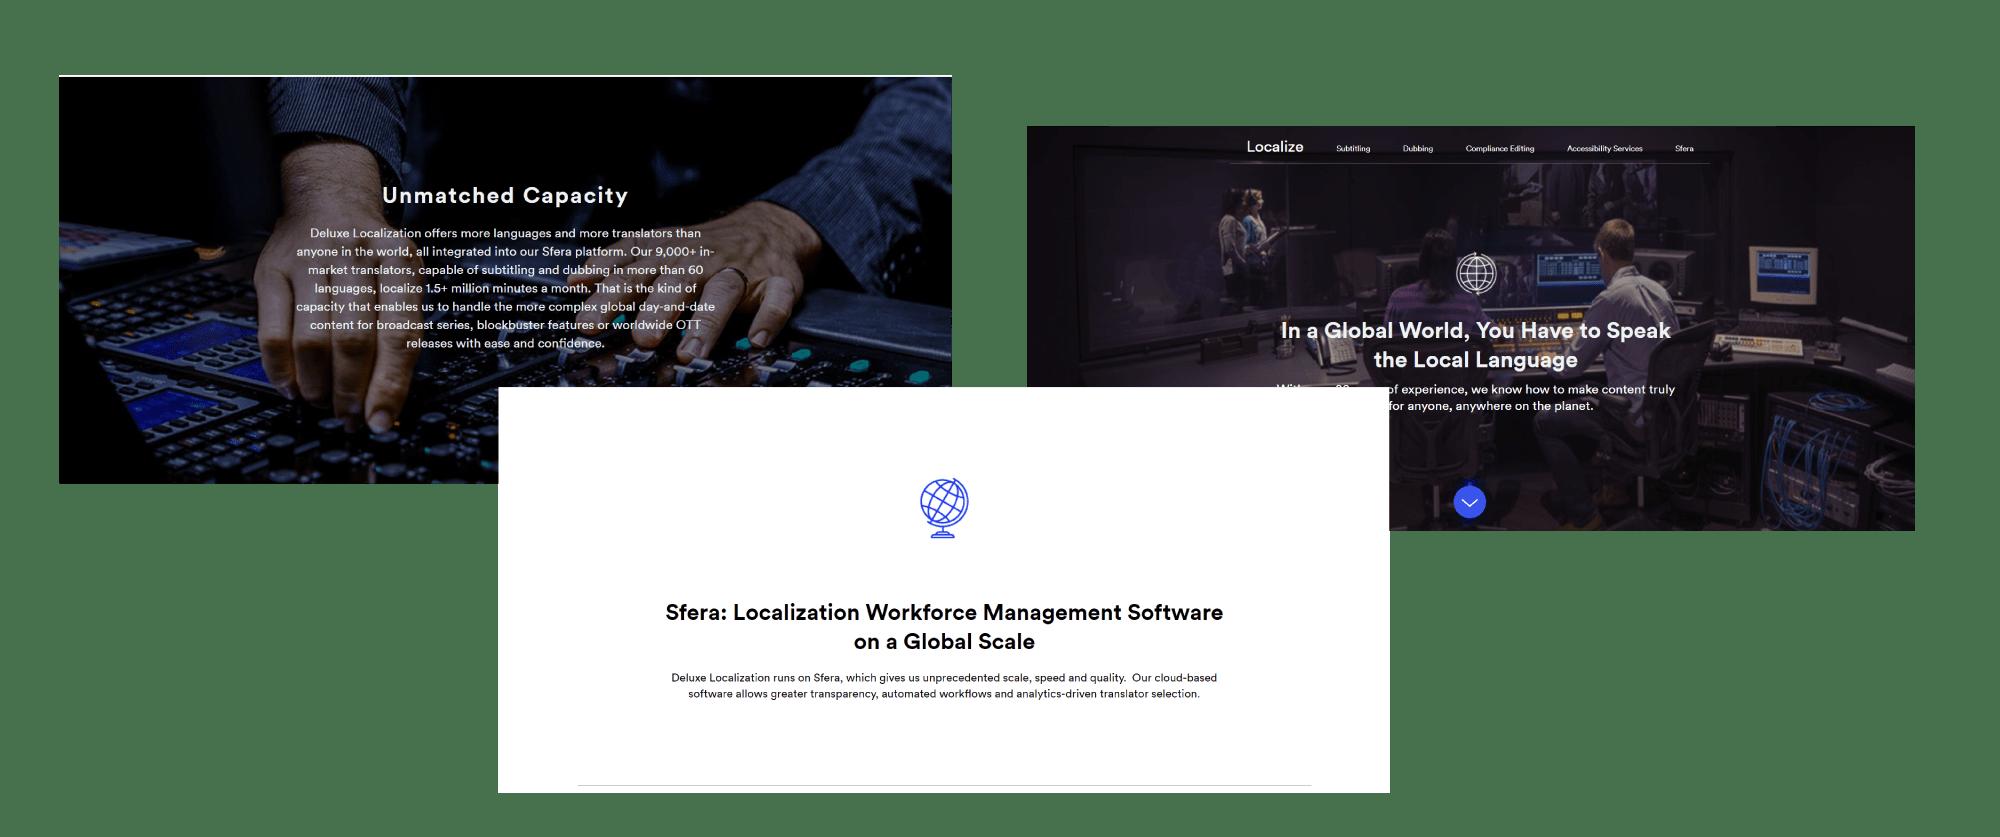 Sfera-Studios solution